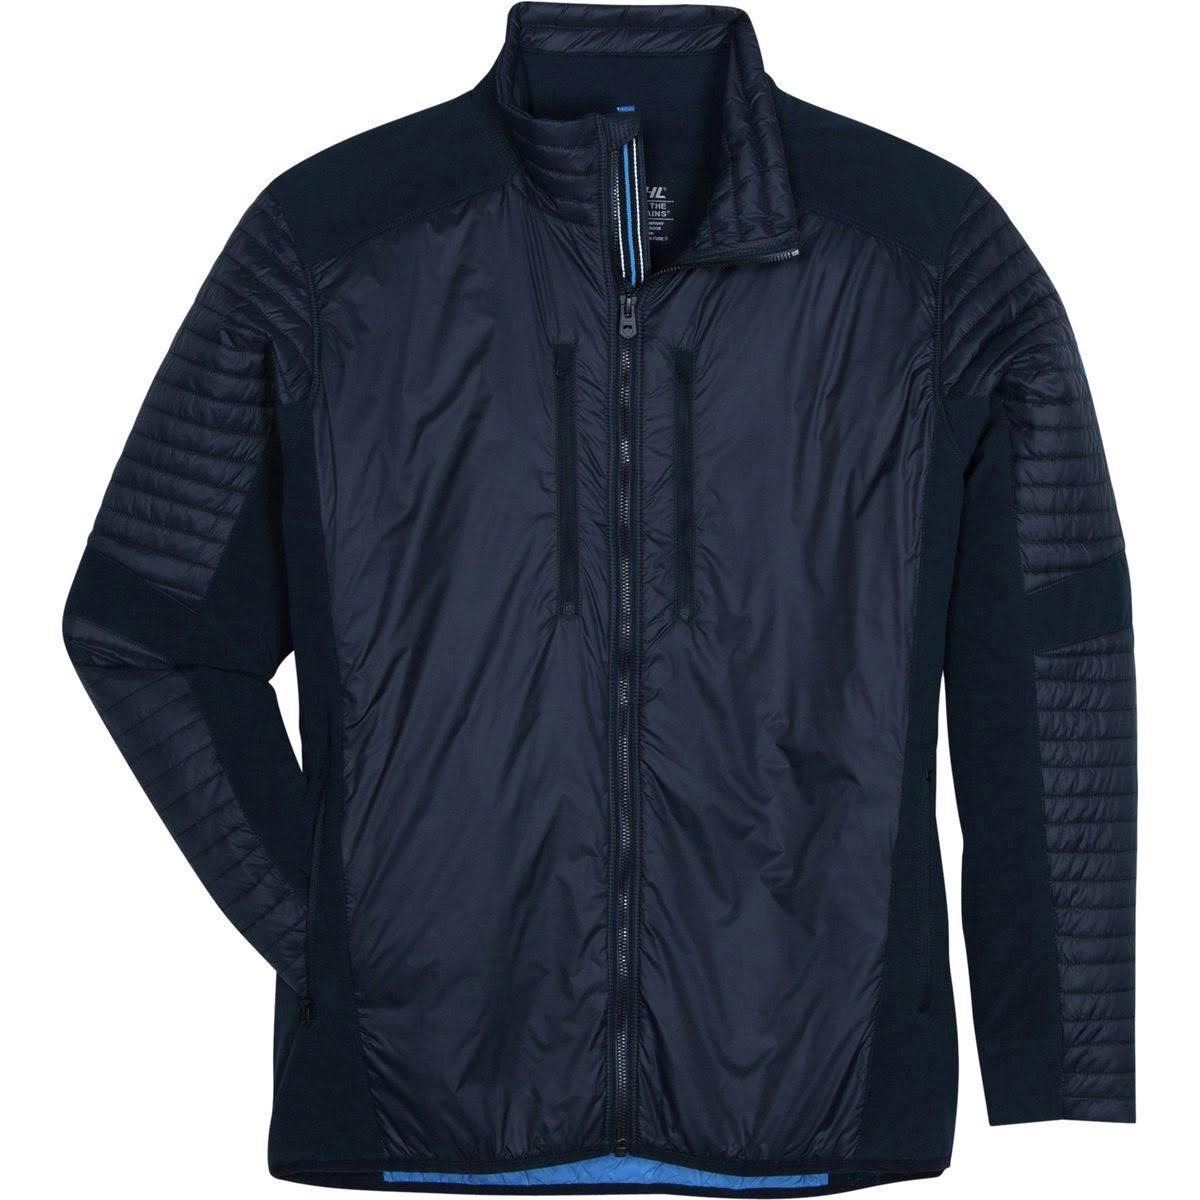 M Ms Blue Kuhl Jacket Firefly Midnight 4TfdaXxqw